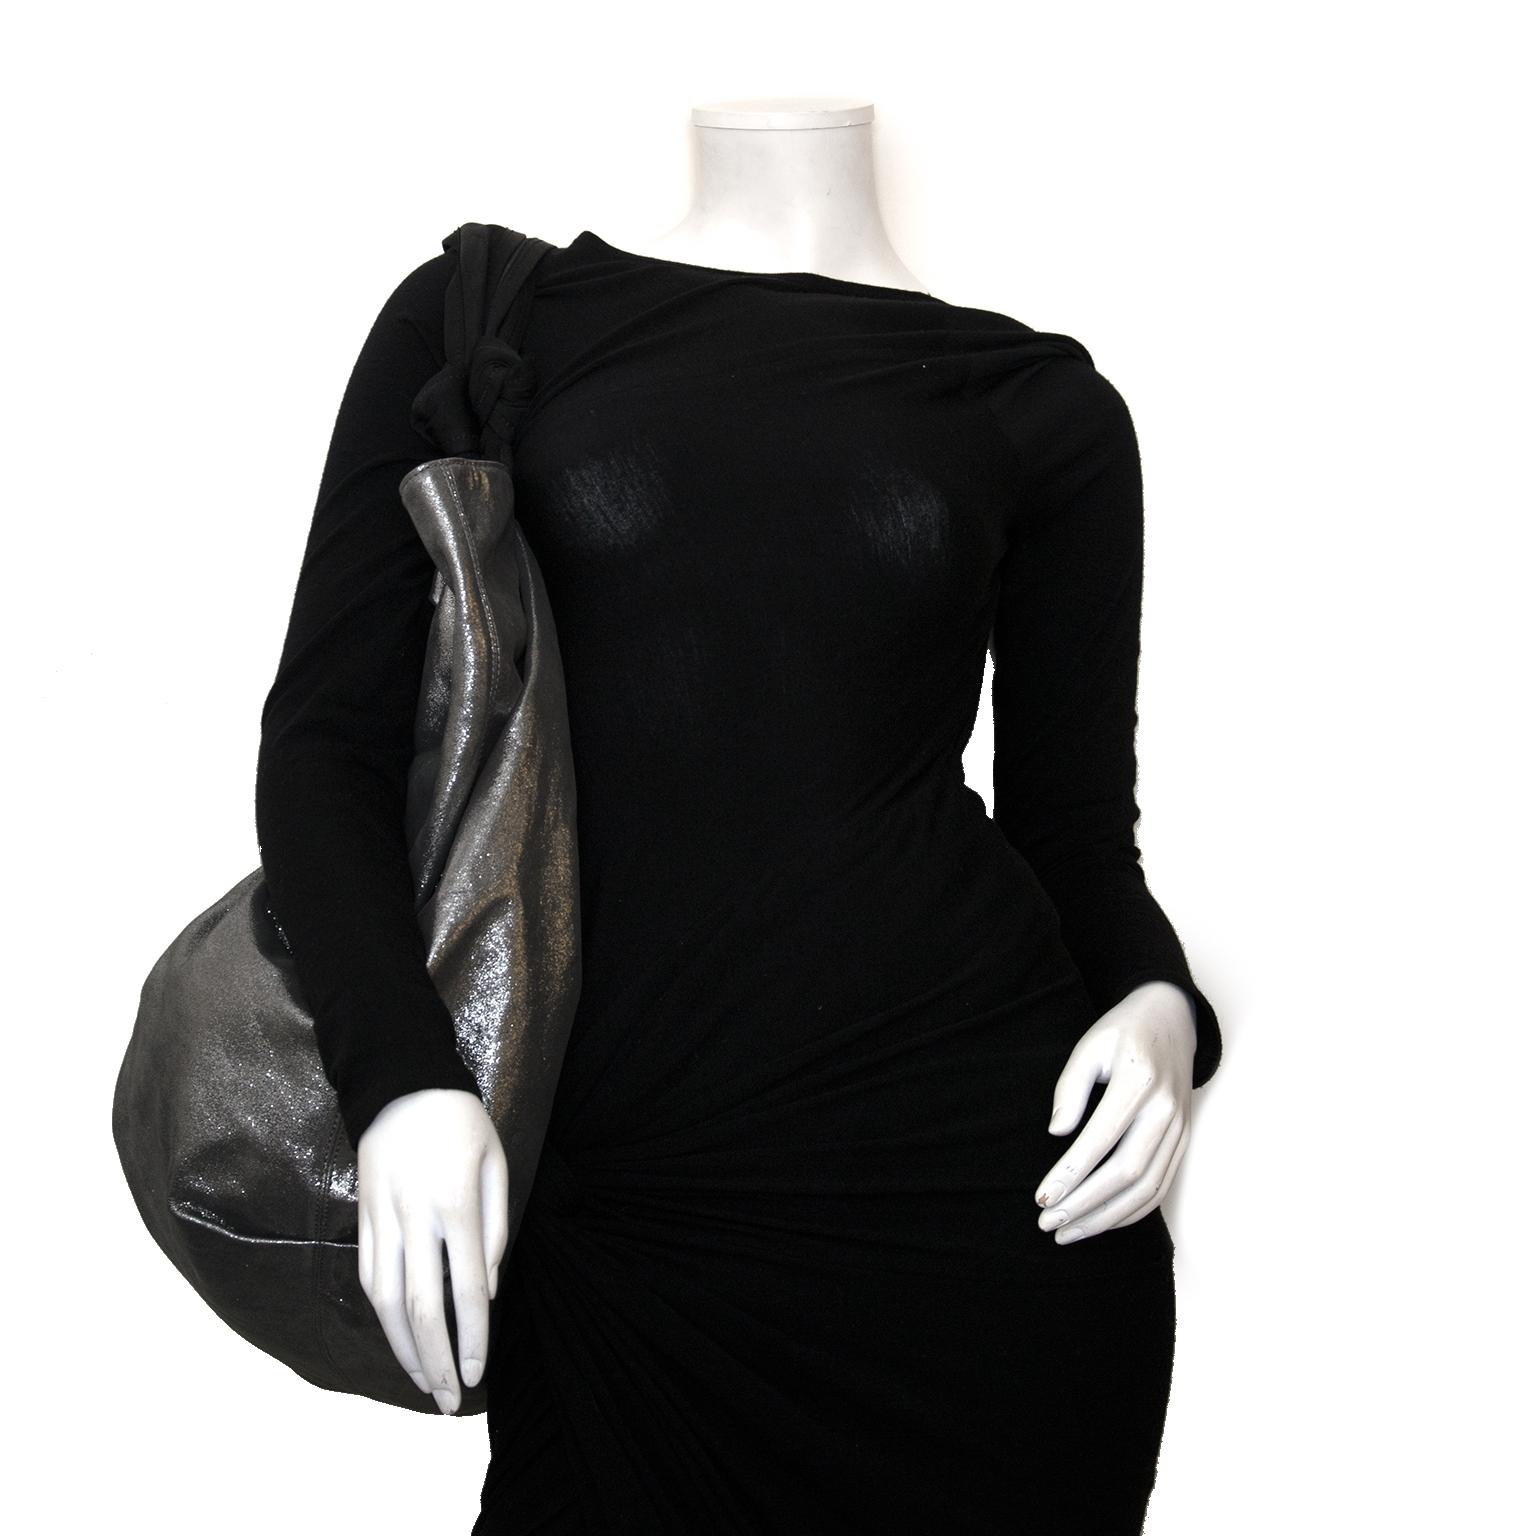 lanvin silver polisson gm bag now for sale at labellov vintage fashion webshop belgium